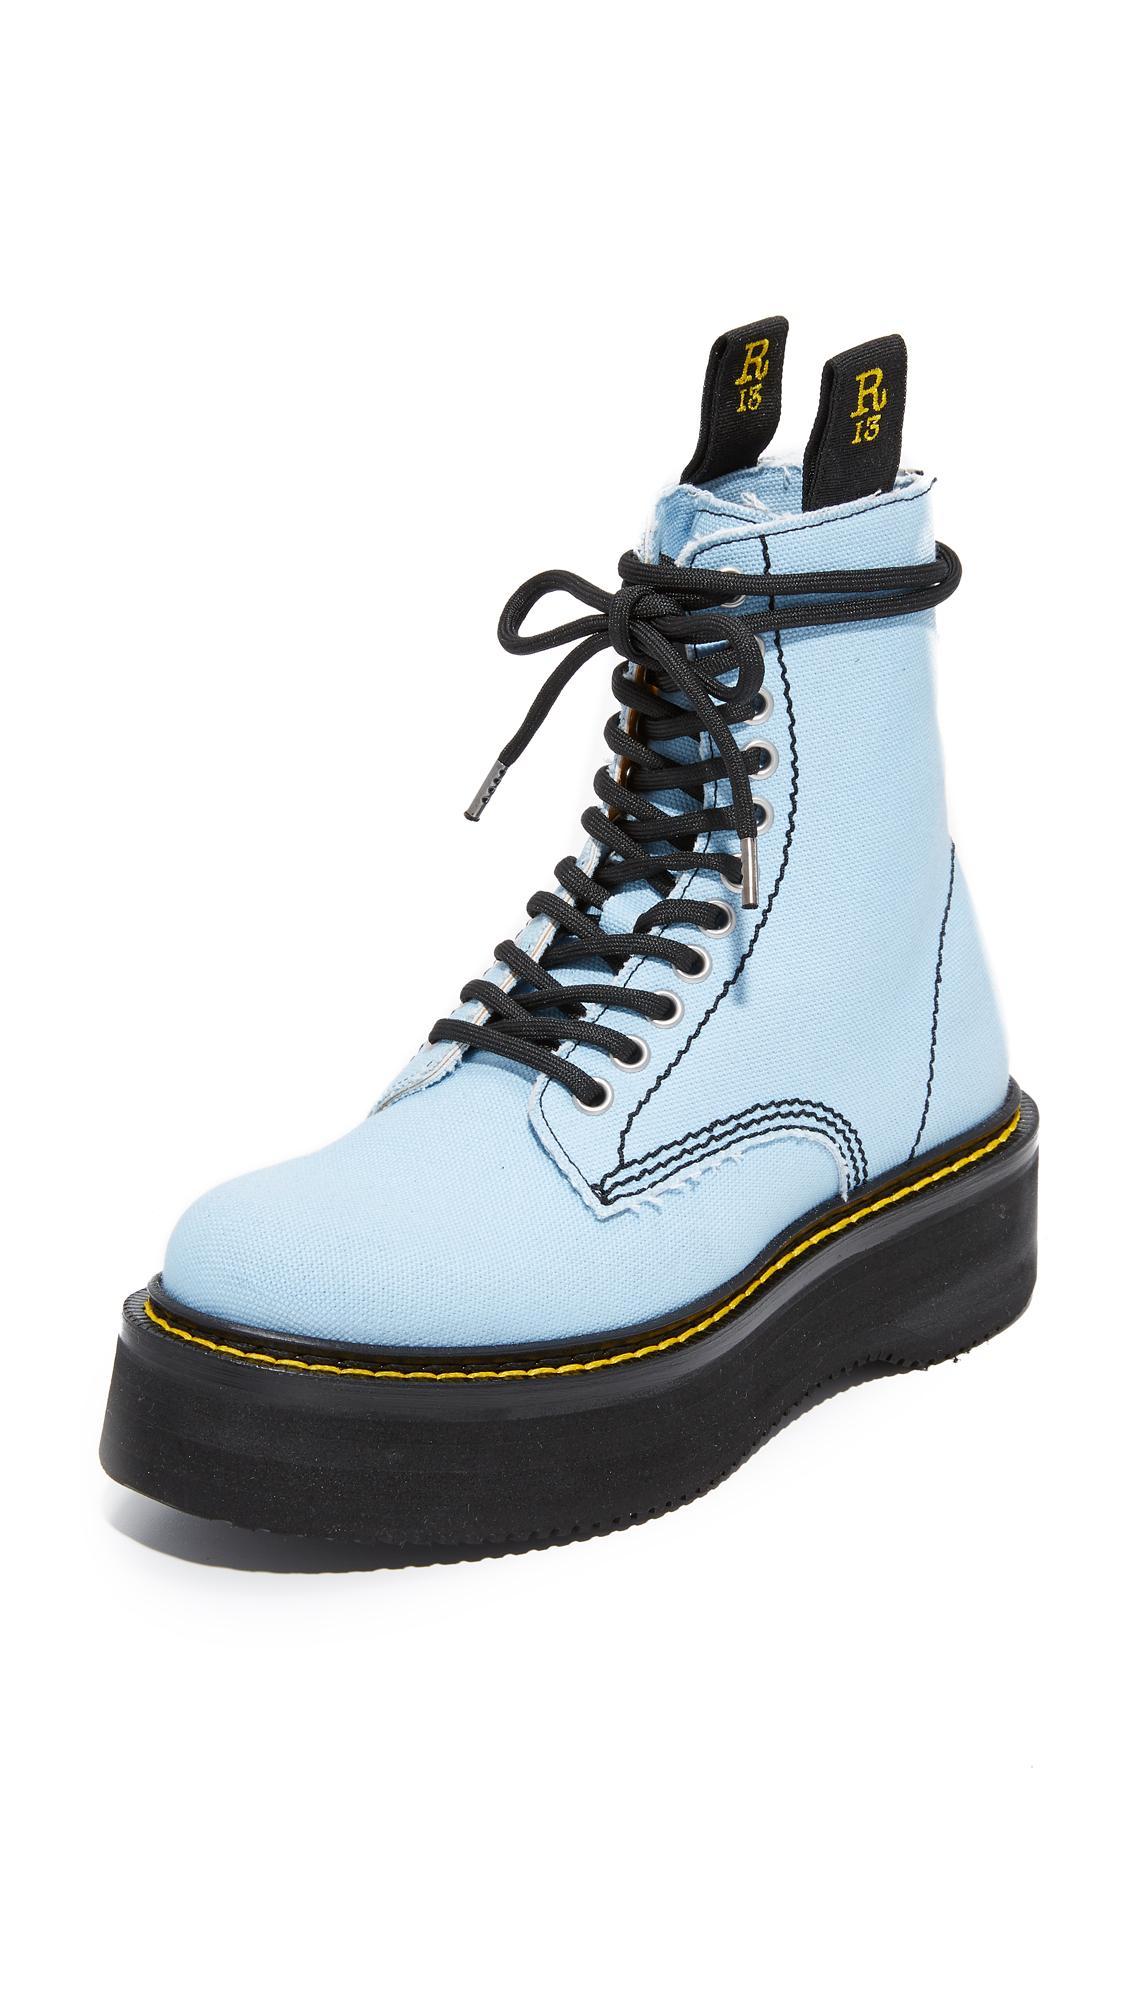 R13 Canvas Stack Boots - Denim